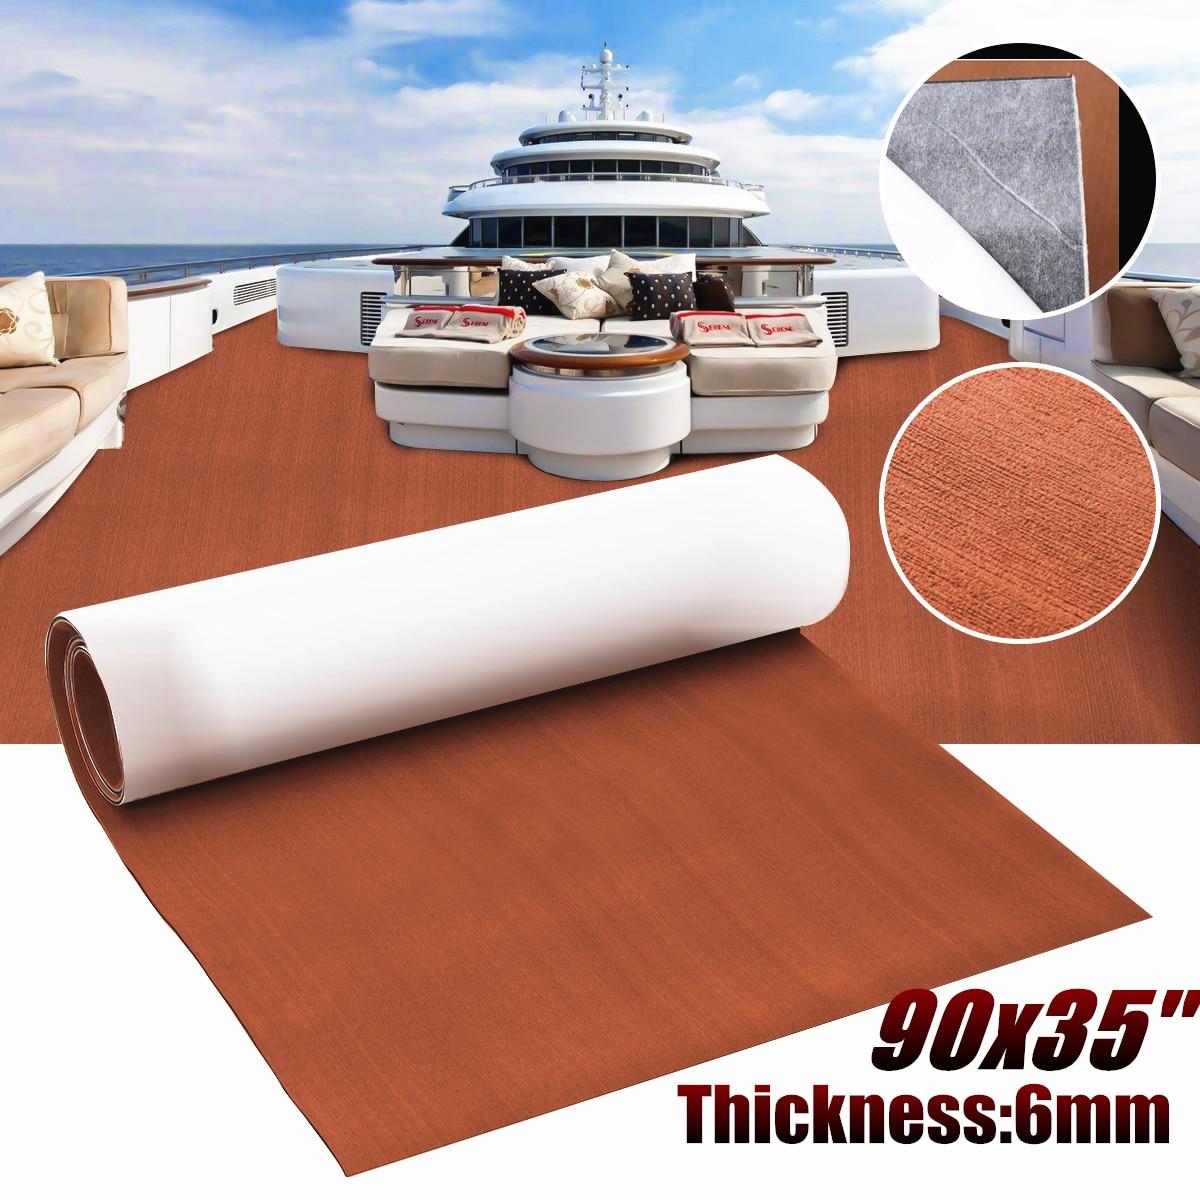 230x90x0.6cm Dark Brown EVA Foam Teak Deck Sheet Mat Pad Self Adhesive Boat Yacht RV Motorhome Synthetic Decking Foam Floor Mat